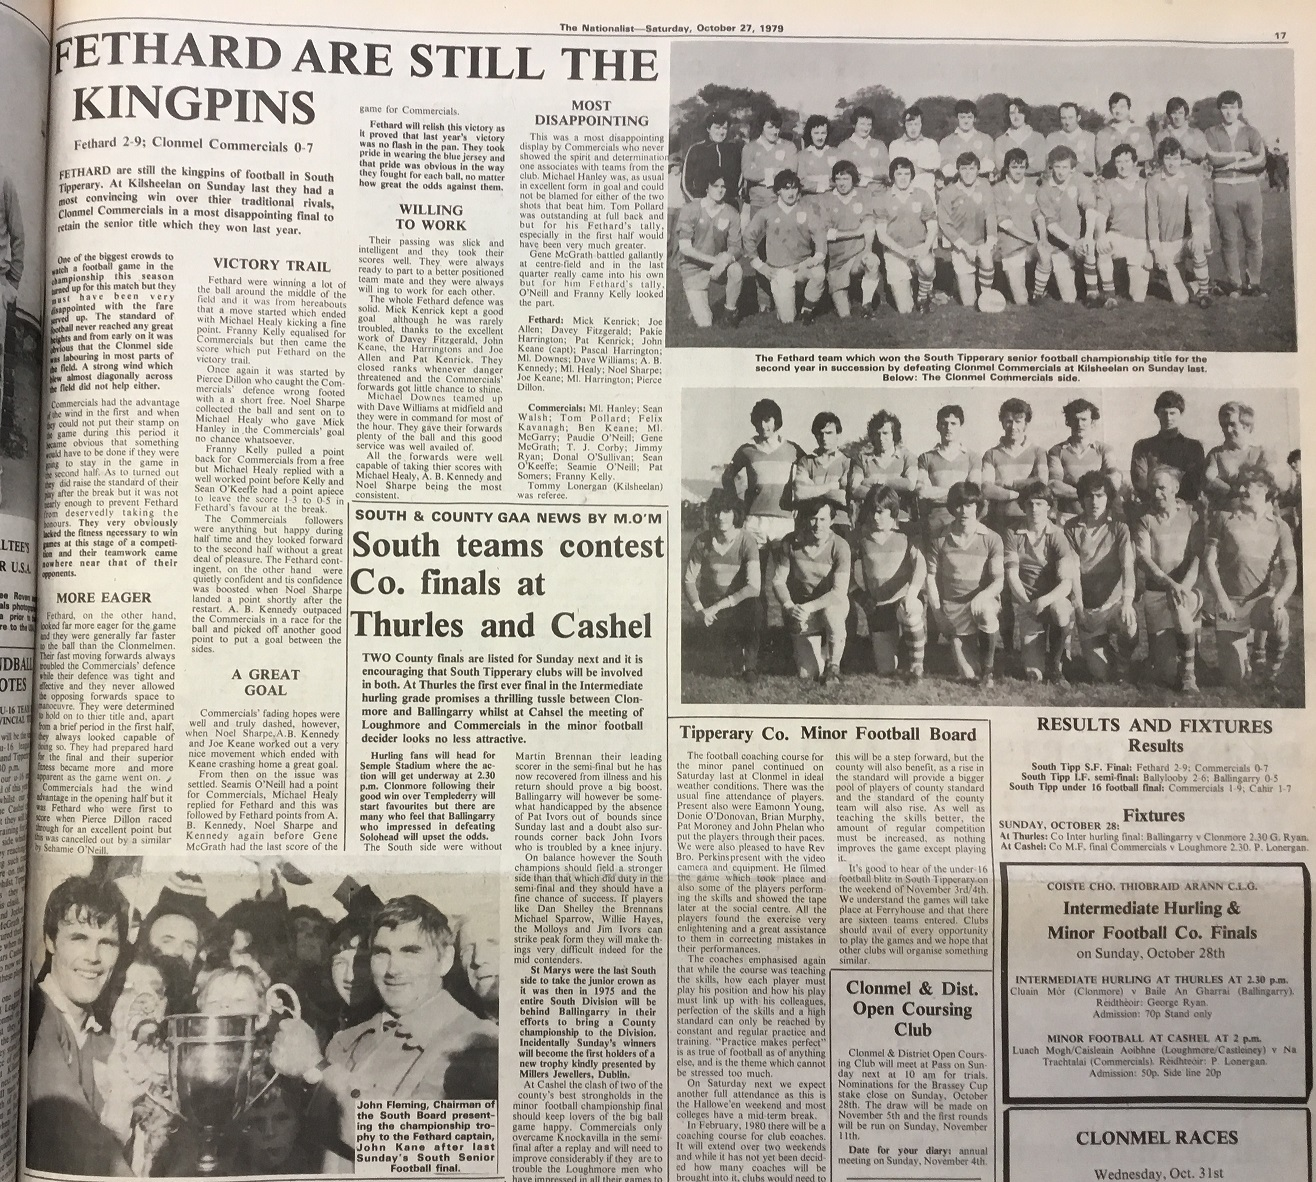 1979 South football final